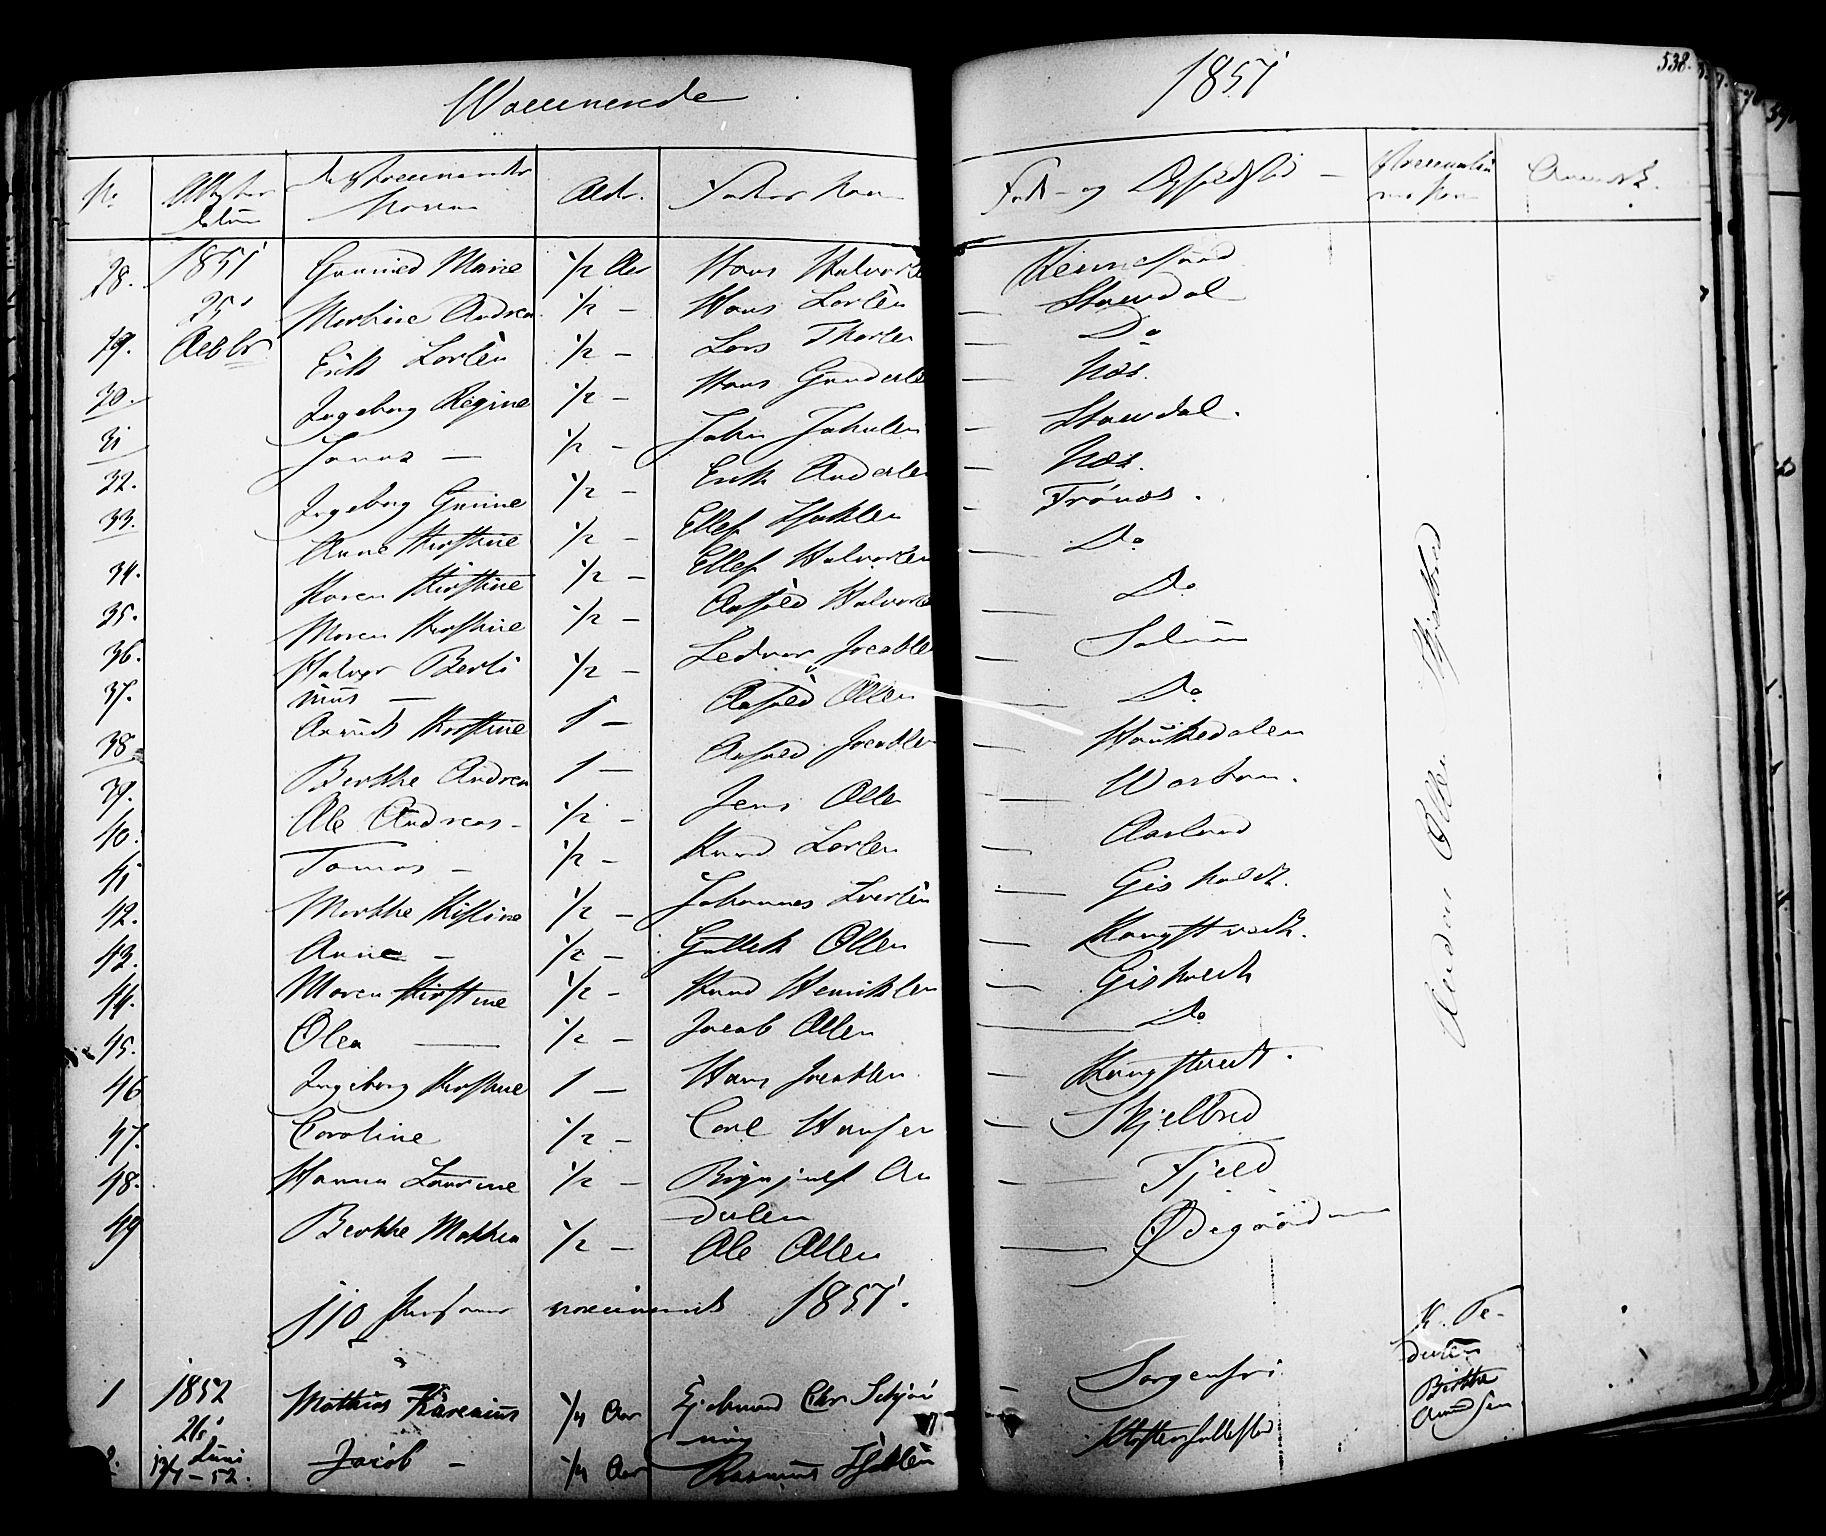 SAKO, Solum kirkebøker, F/Fa/L0006: Ministerialbok nr. I 6, 1844-1855, s. 538